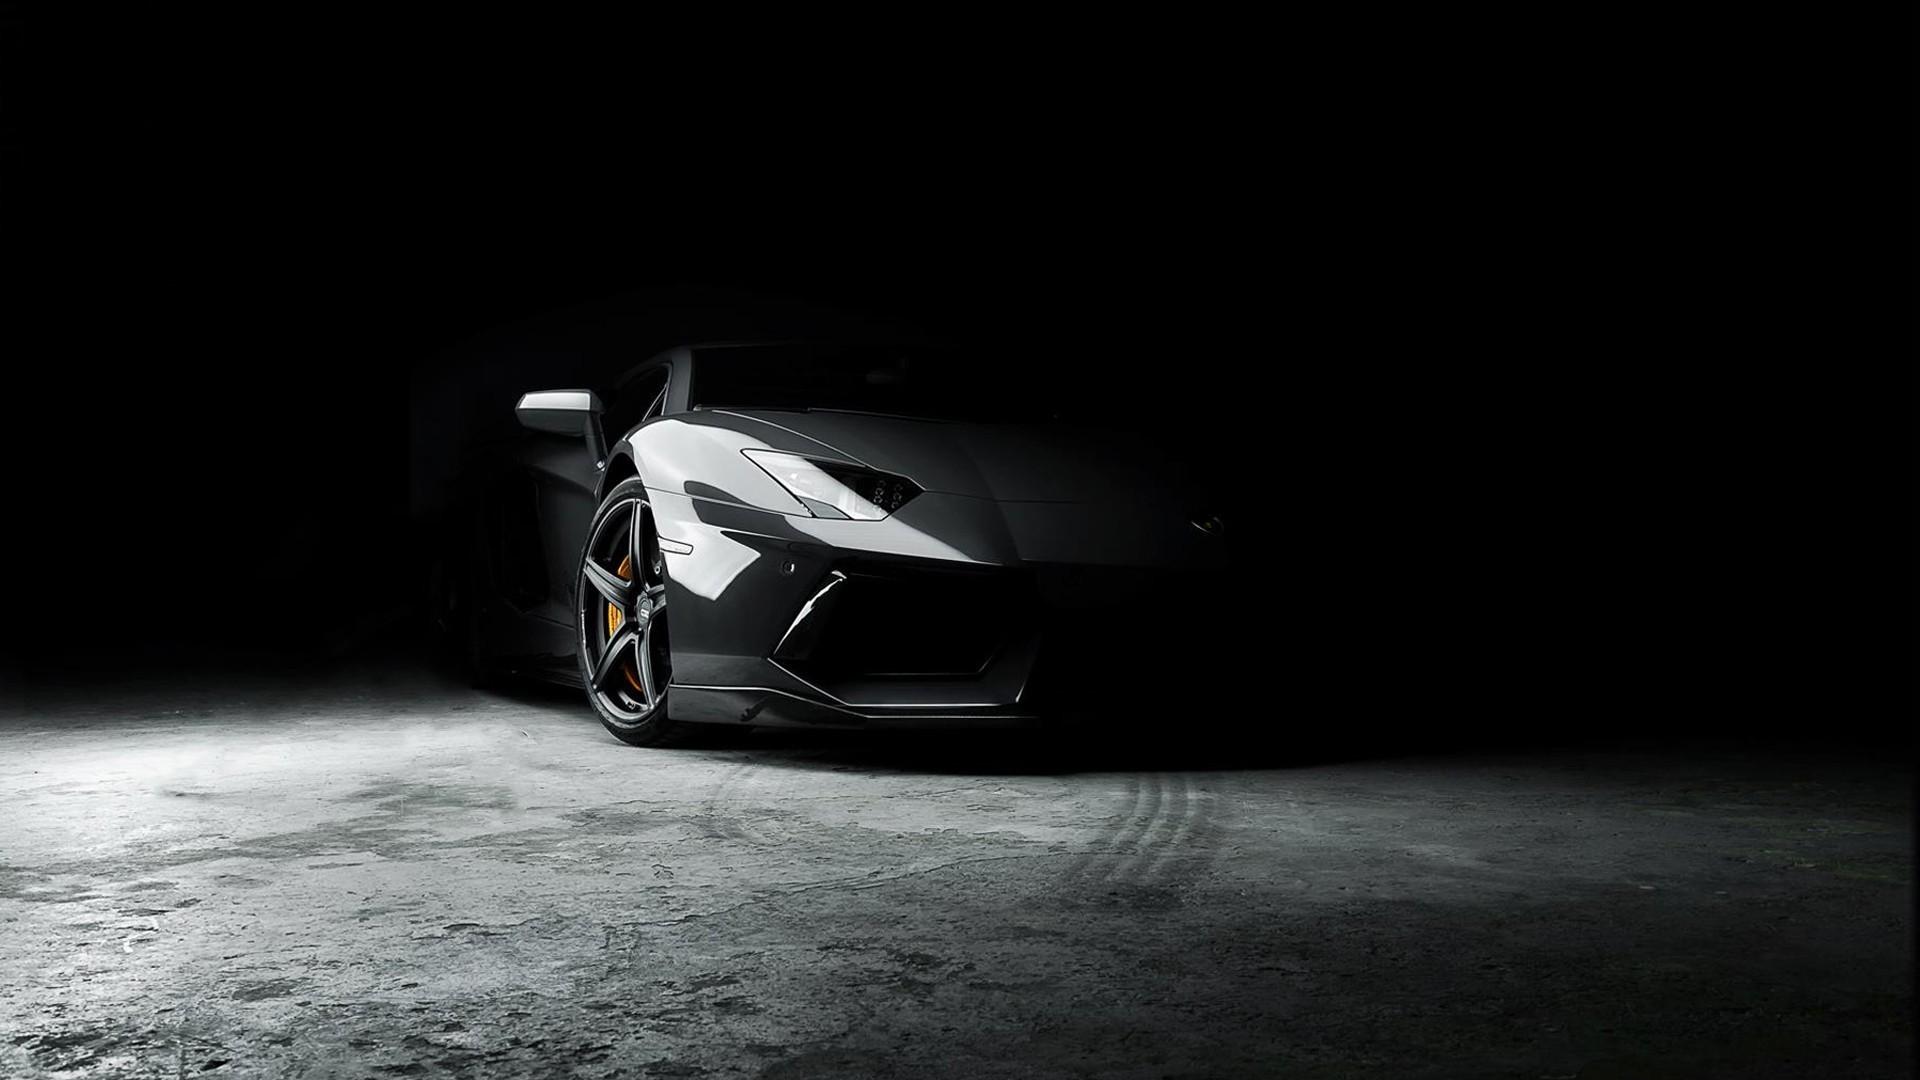 Lamborghini Wallpaper Lamborghini Black Wallpaper Hd